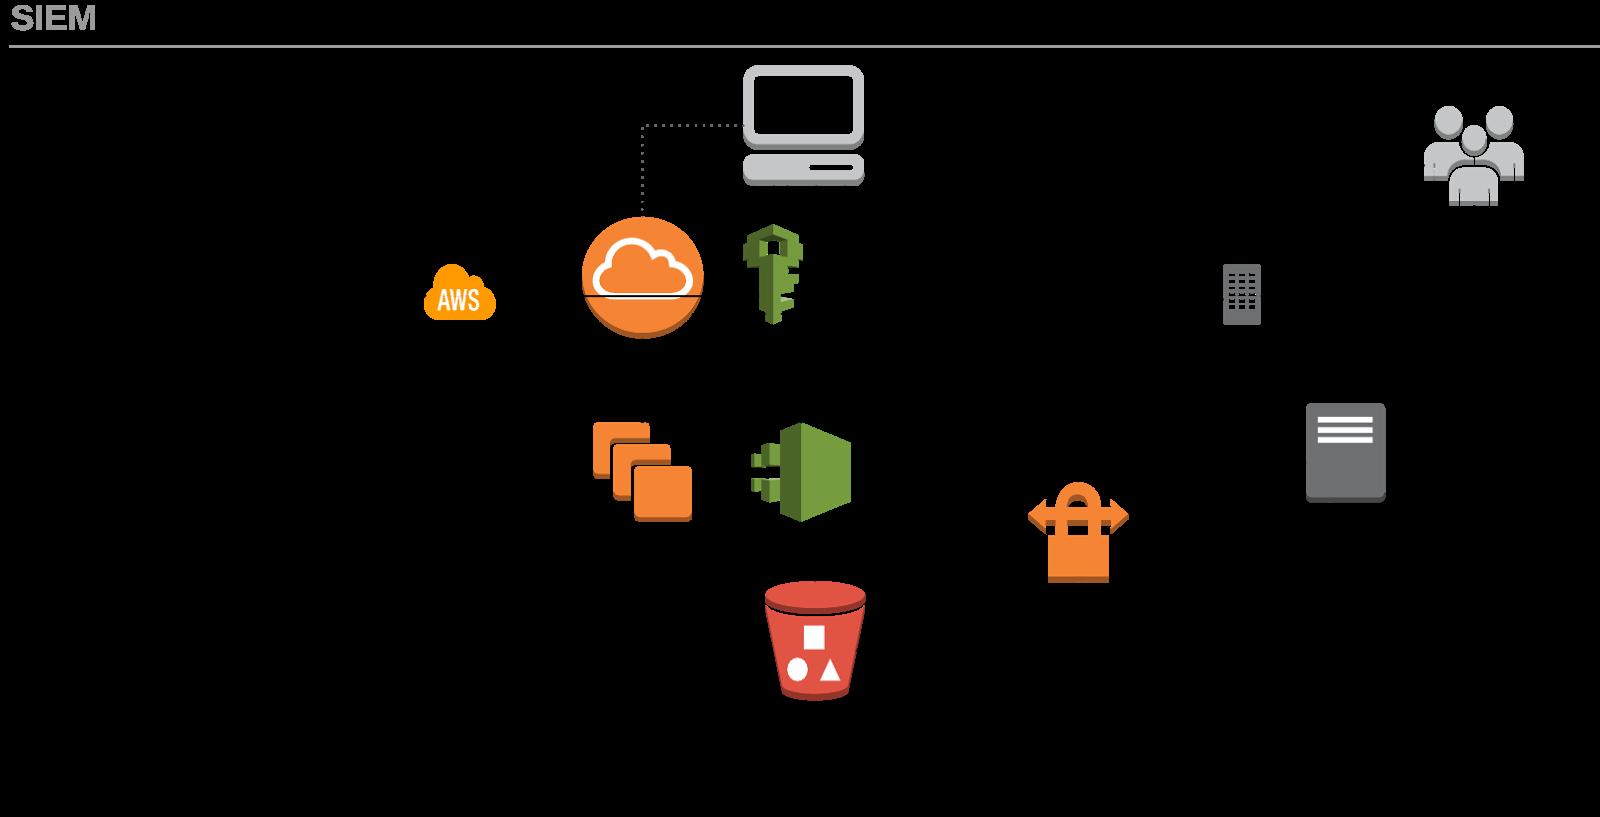 security+: Self-Defending Cloud PoC or Amazon CloudWatch